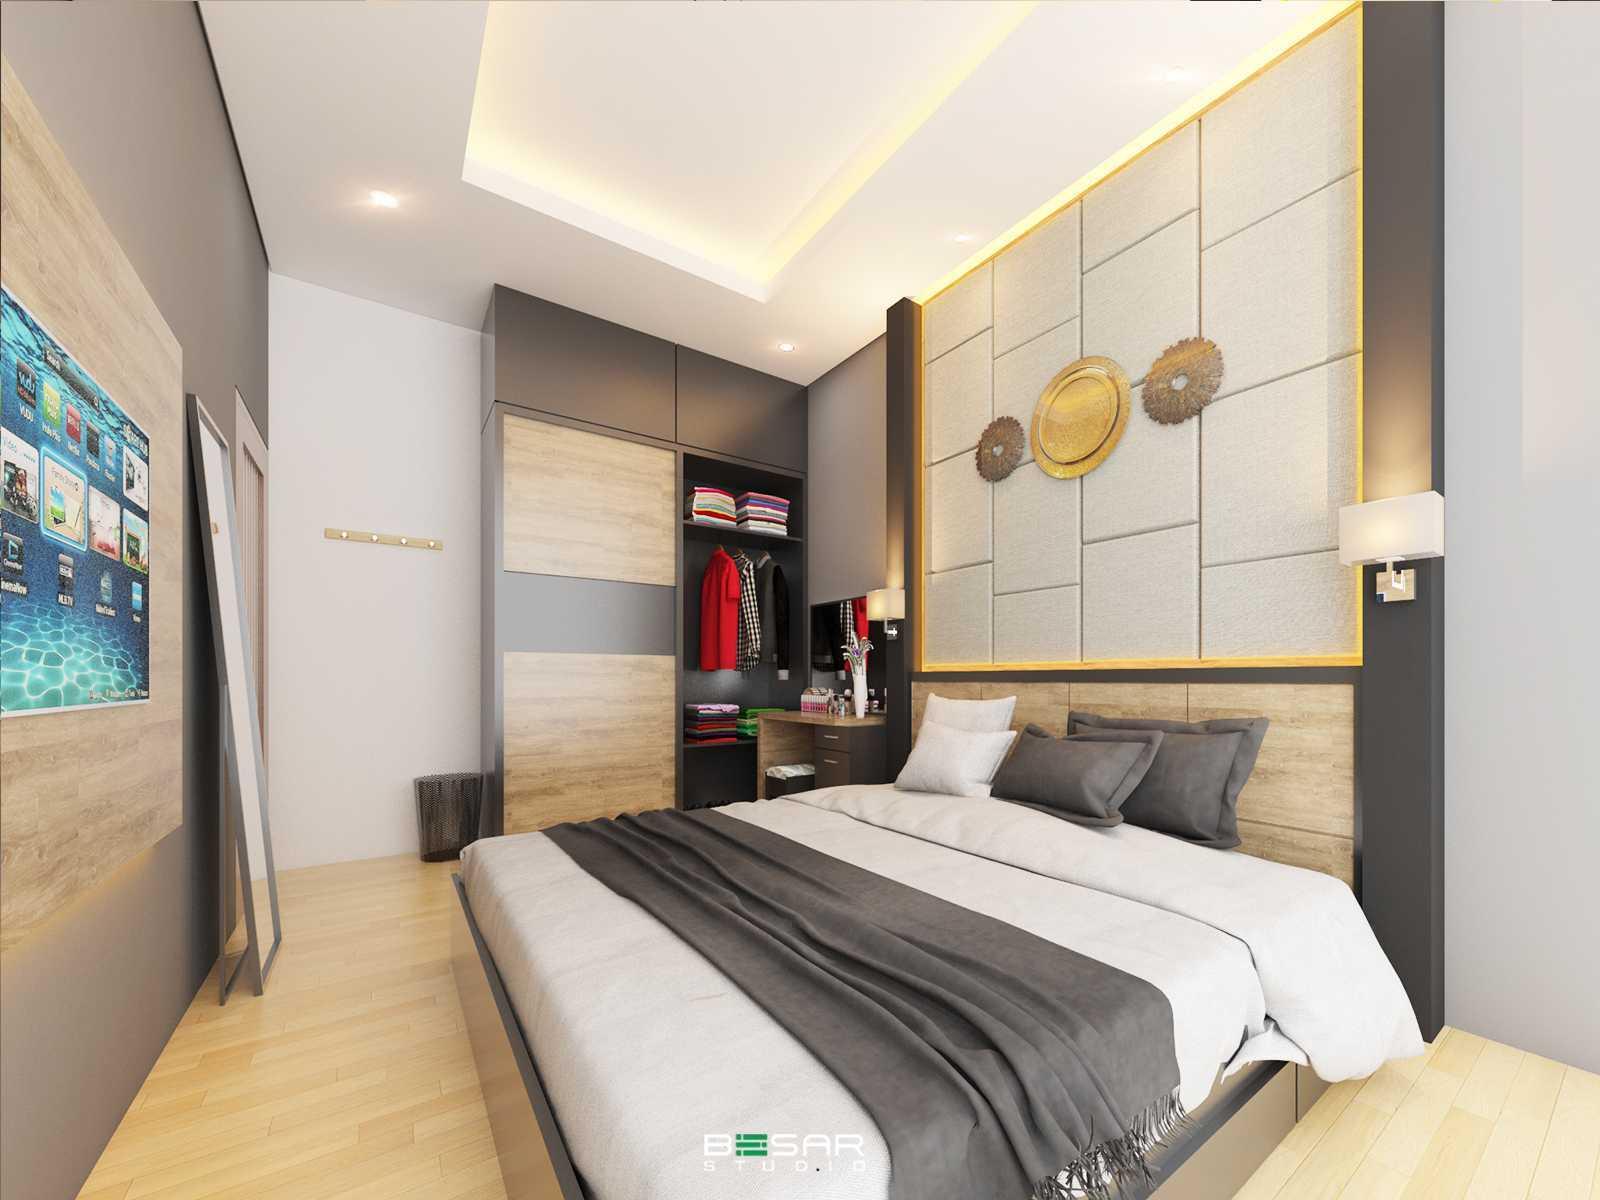 Studio Besar R-House, Cikarang Cikarang Utara, Bekasi, Jawa Barat, Indonesia Cikarang Utara, Bekasi, Jawa Barat, Indonesia Kamar Utama Contemporary 60035